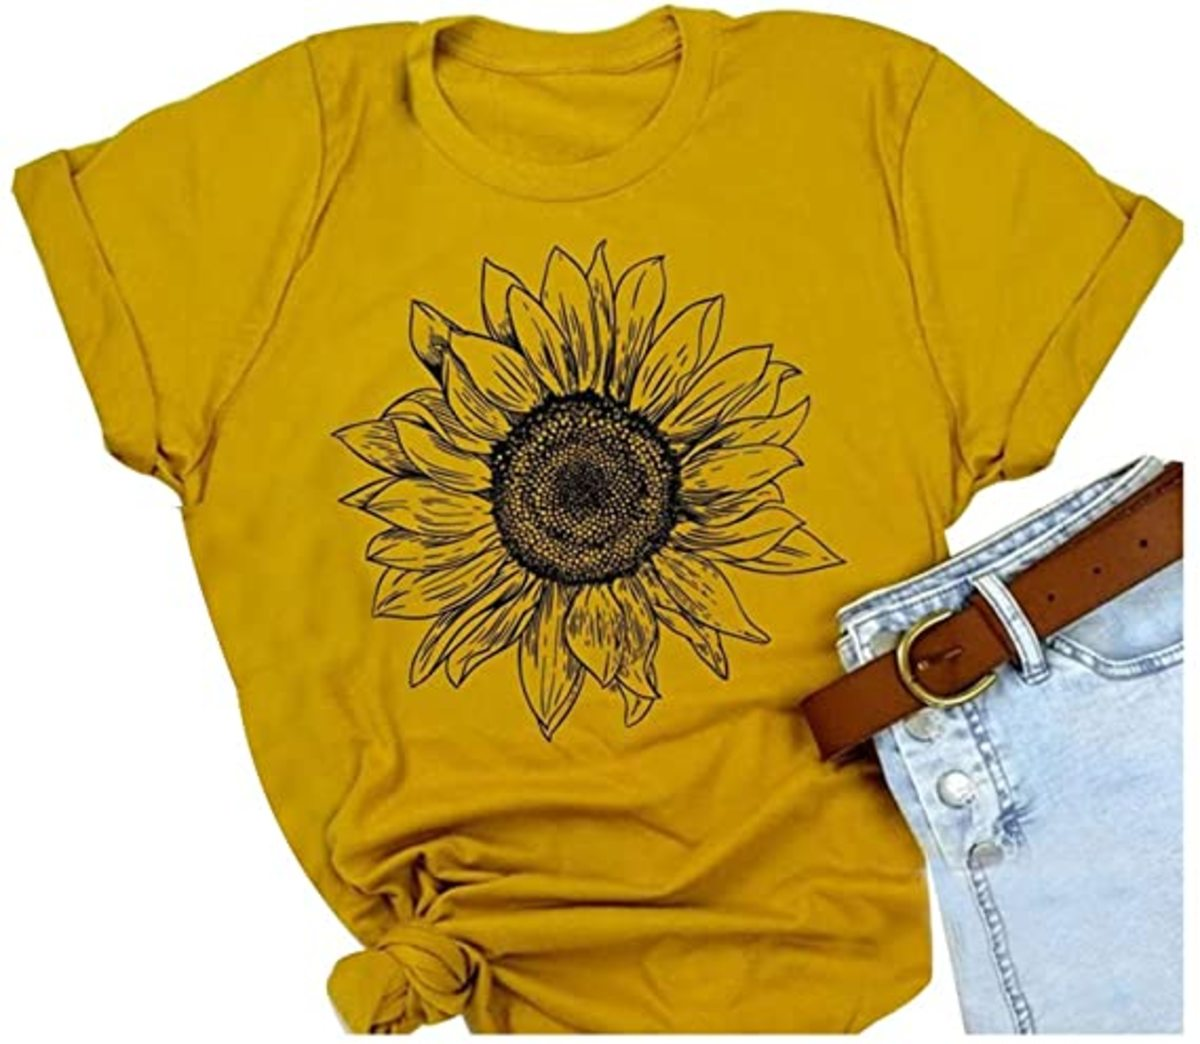 printed-t-shirts-clothing